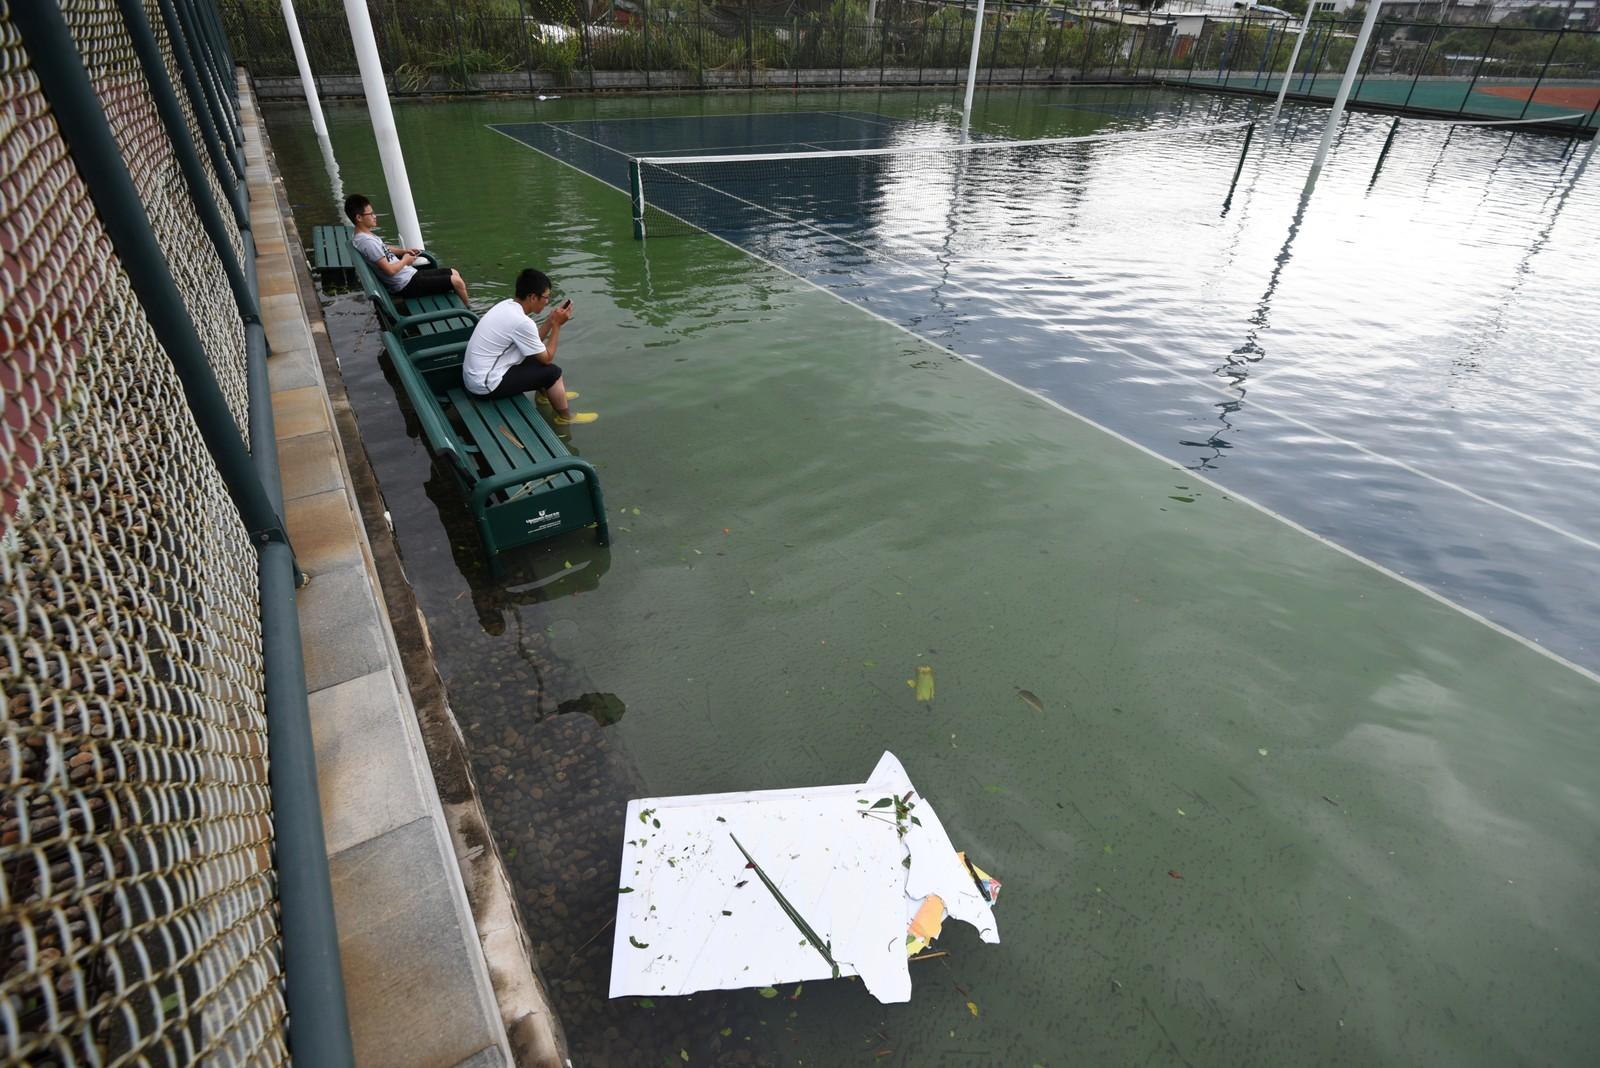 MYE VANN: Tennisbanen i Xiamen ligger under vann.